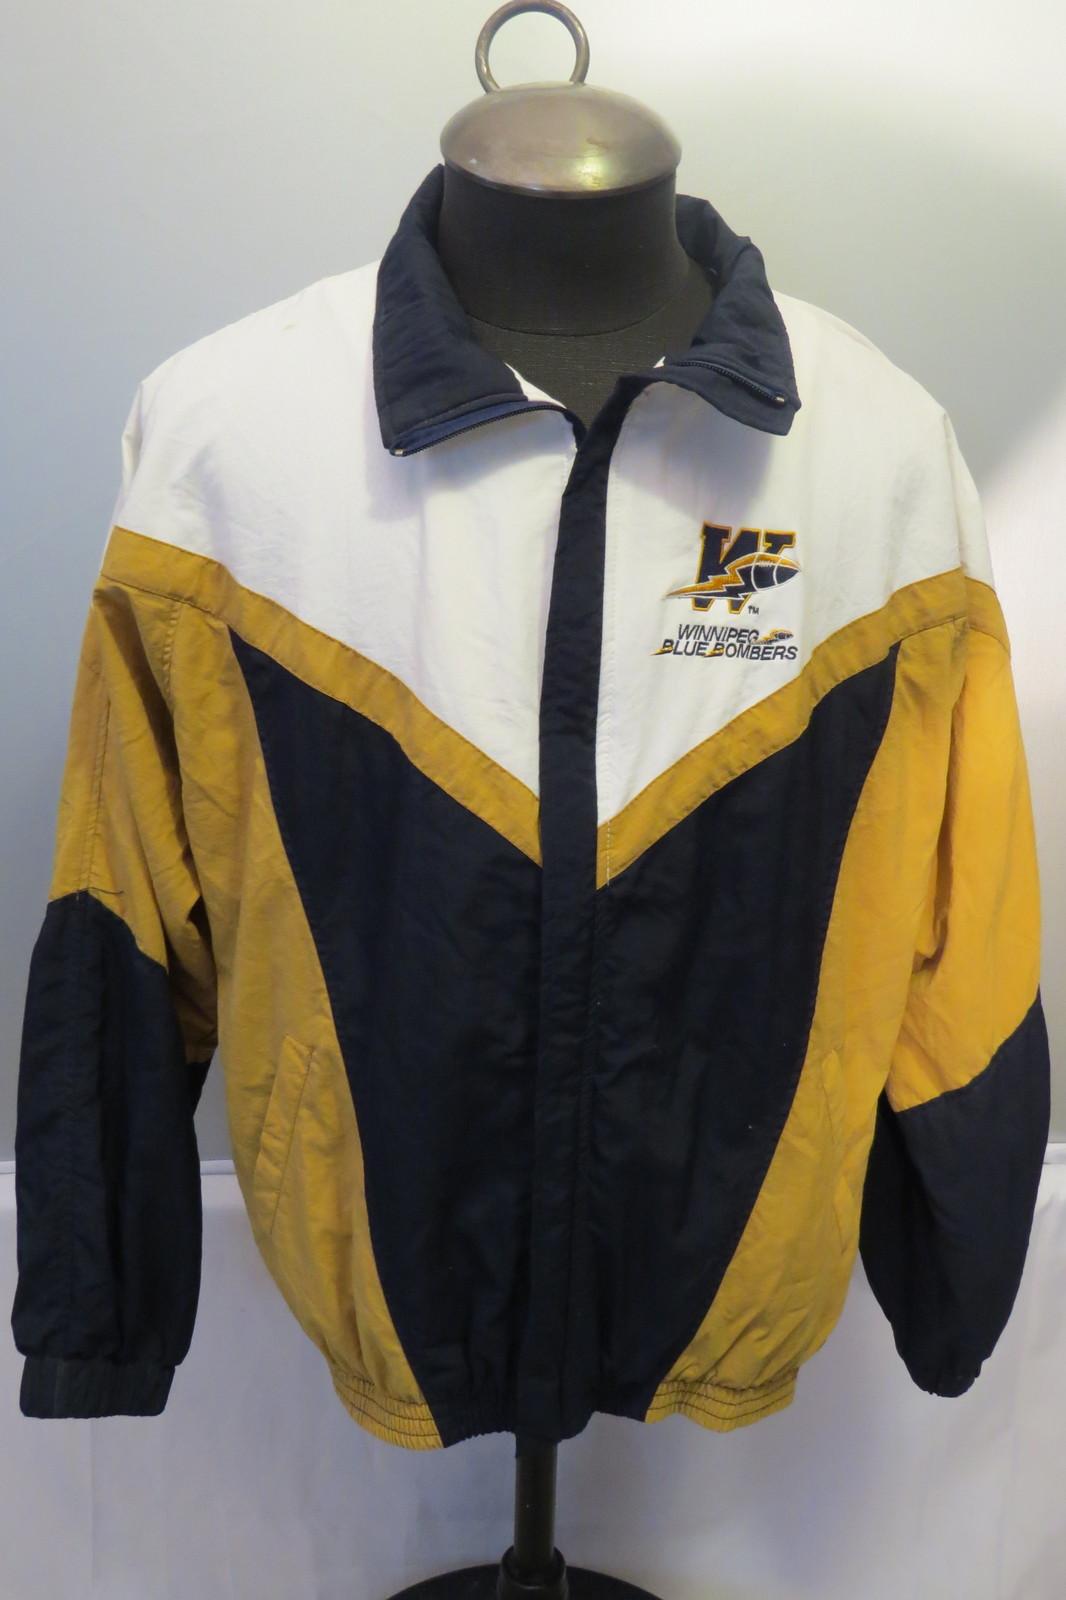 Winnipeg Blue Bombers Jacket (VTG) - Men's Zip Up by Pace Setter - Men's Large - $95.00